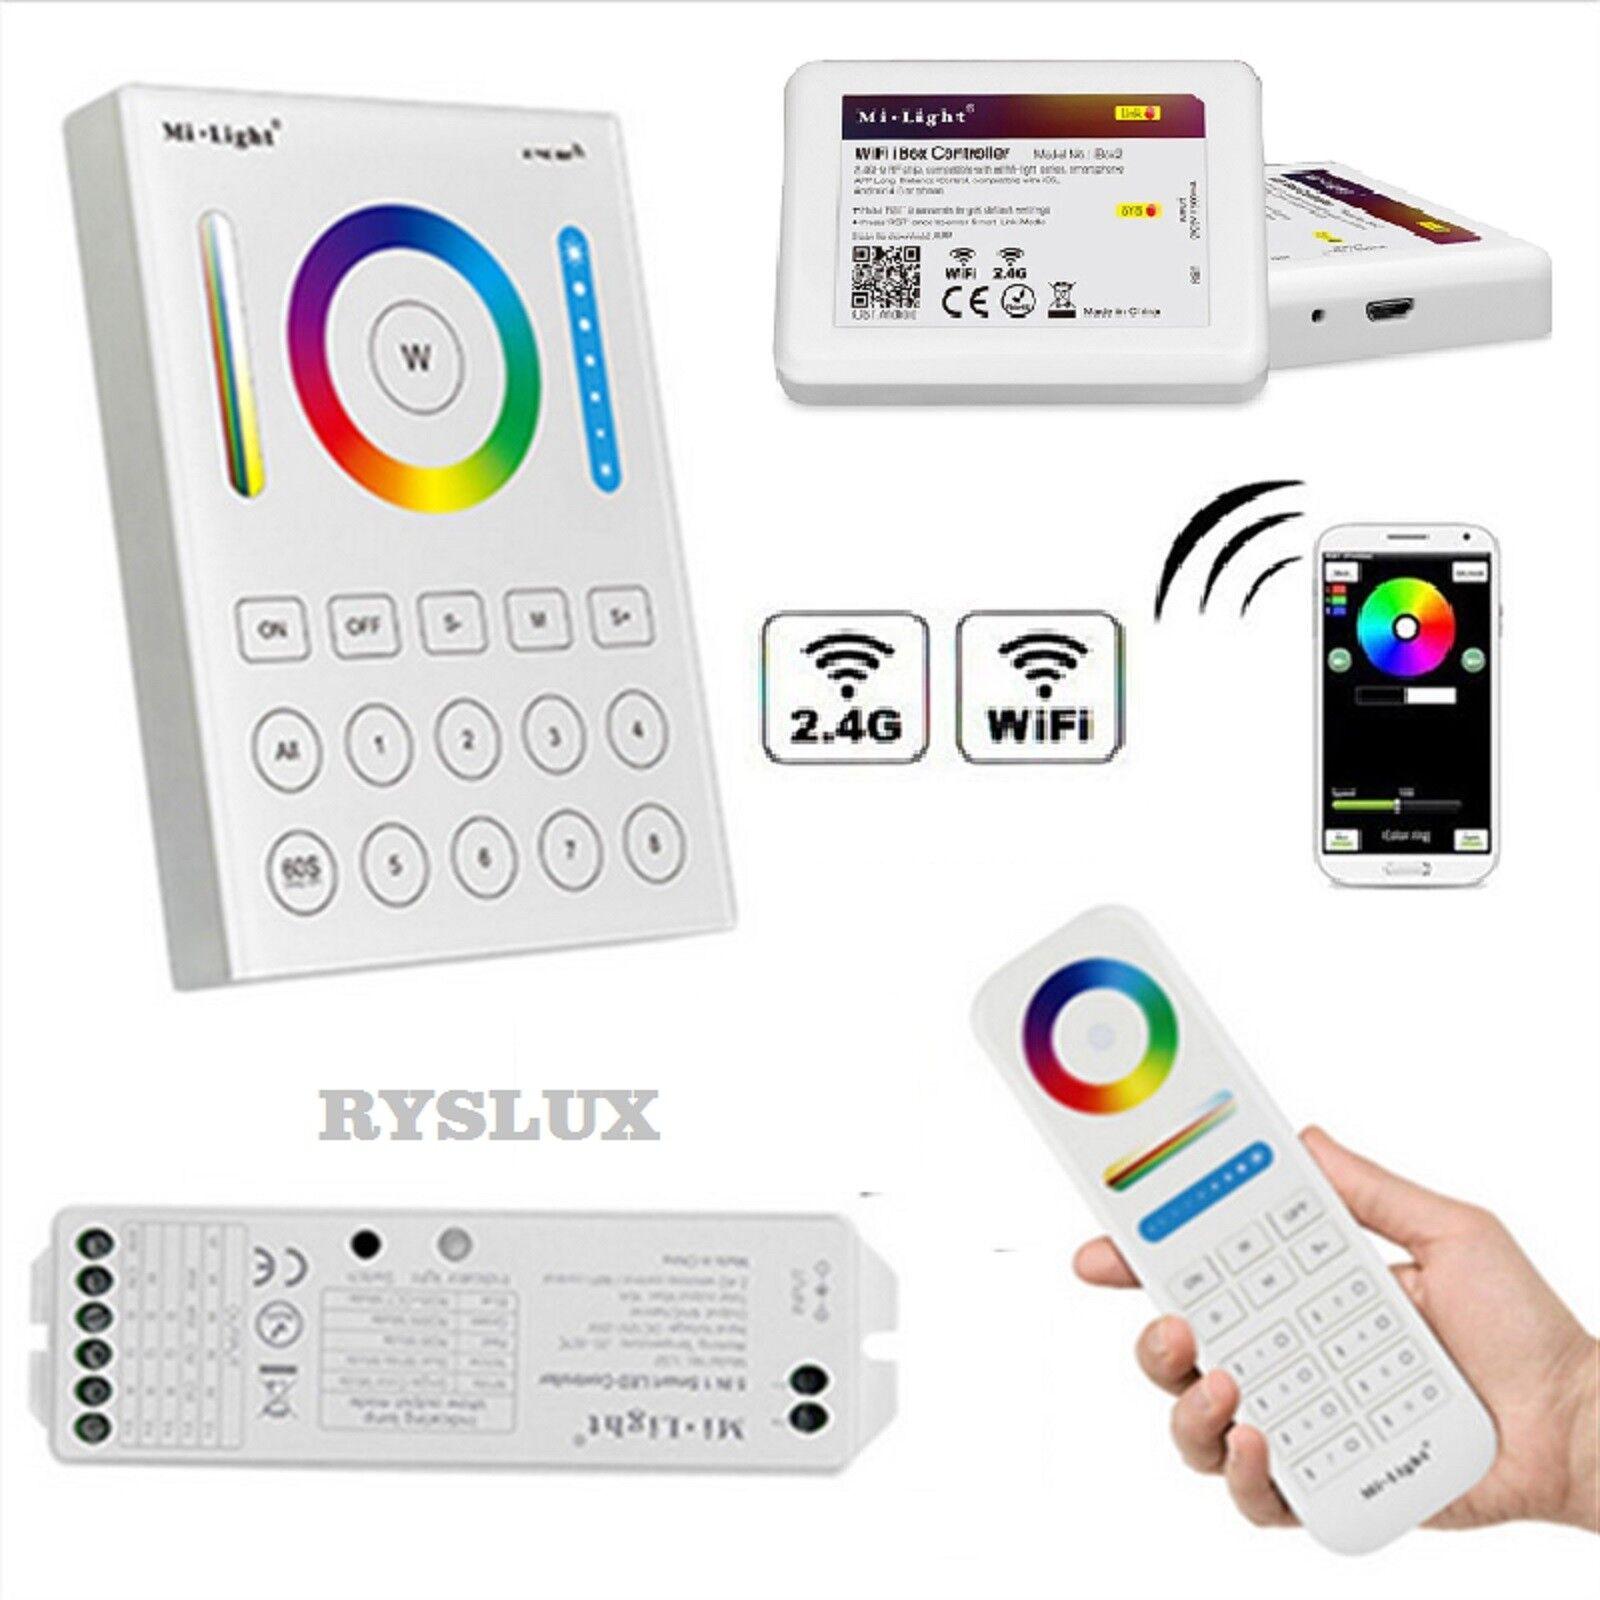 Mi-Light LS2 2.4G LED Controller 8 Zonen 5in1 WiFi Wlan App RGB+CCT RGB+WW RGBW